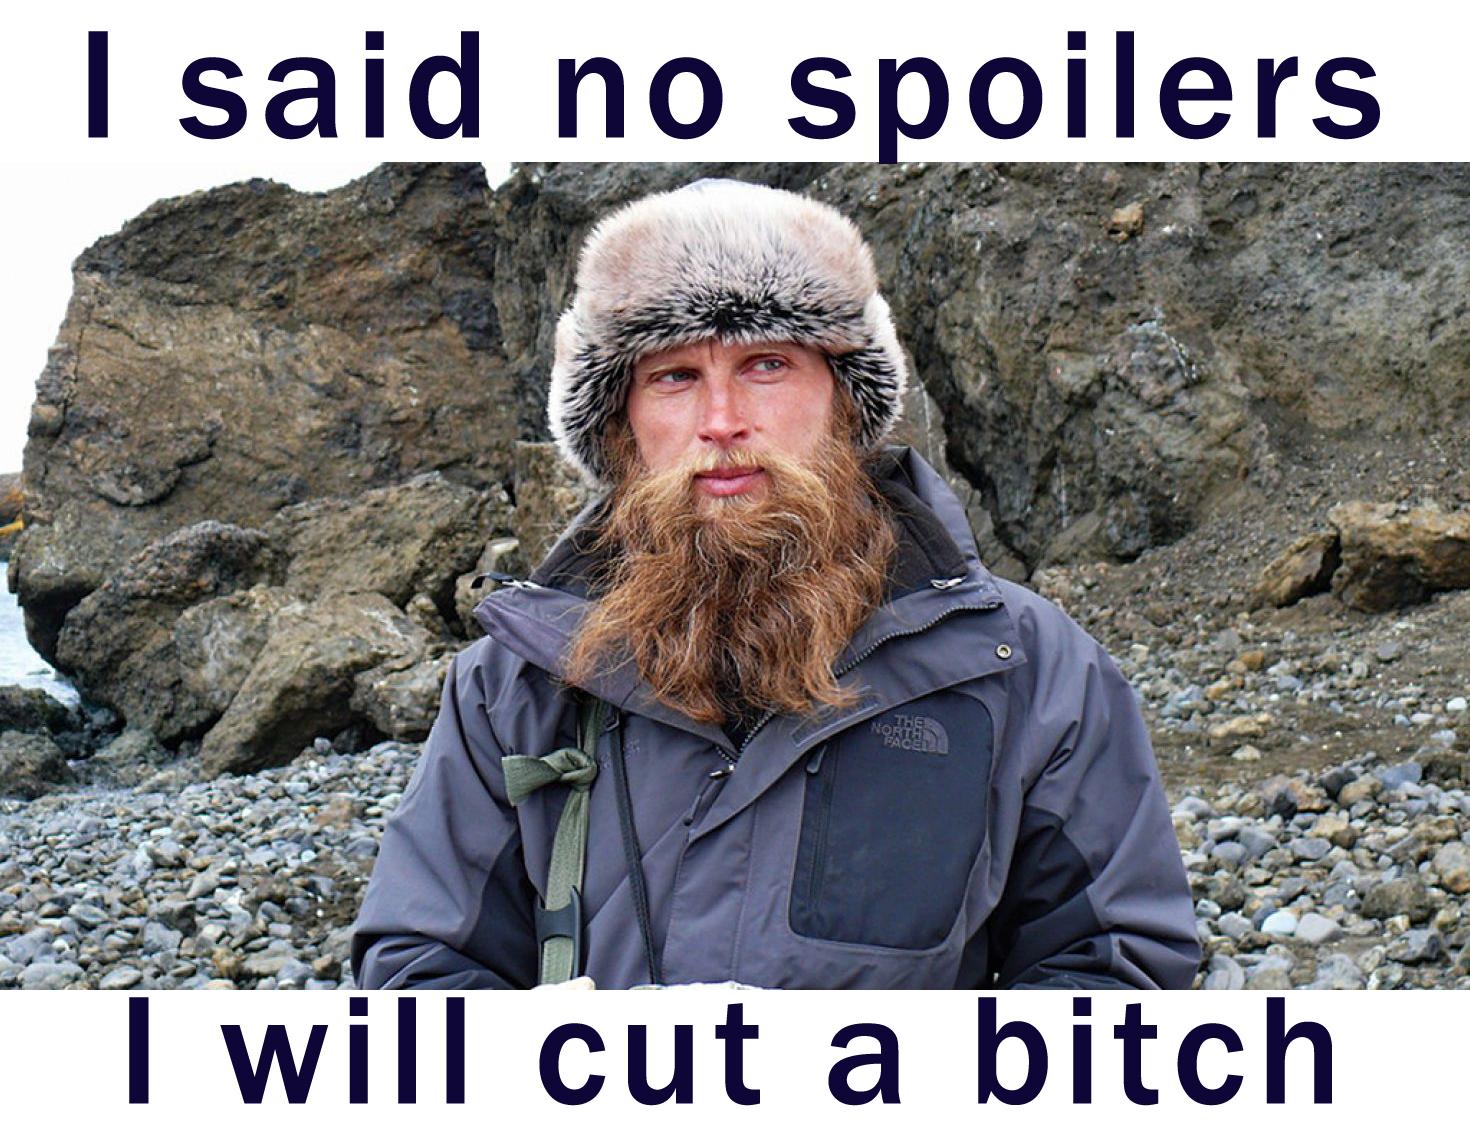 no-soilers-cut-a-bitch copy